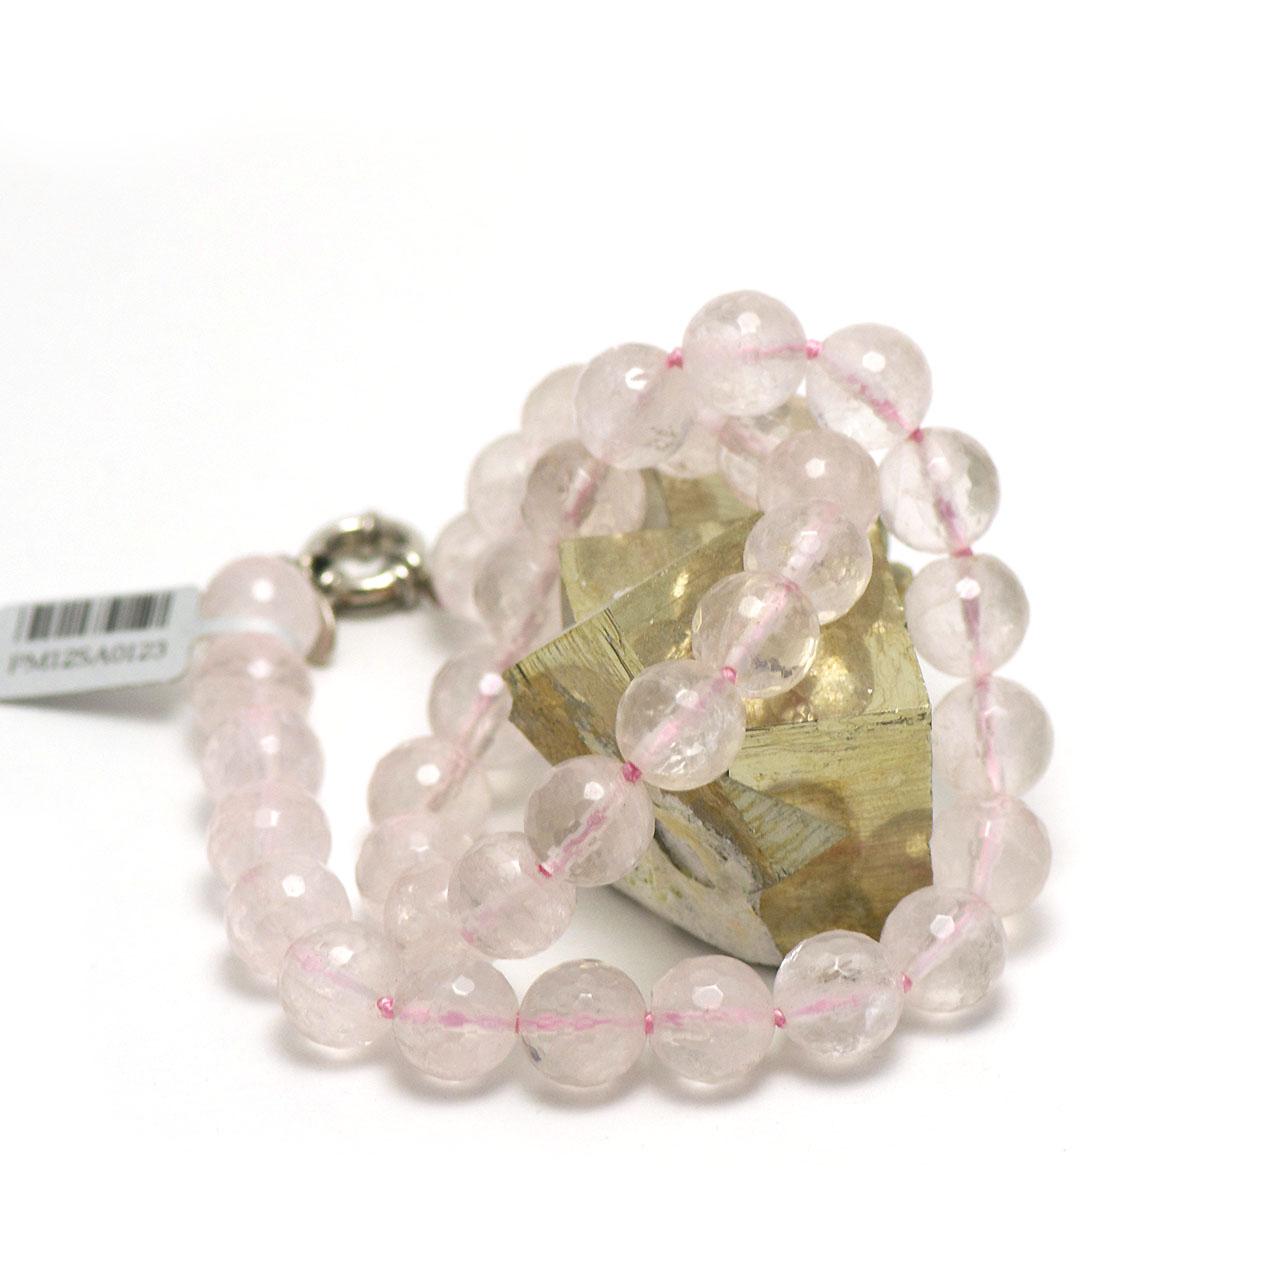 Collier quartz rose  perle ronde facettée 12 mm